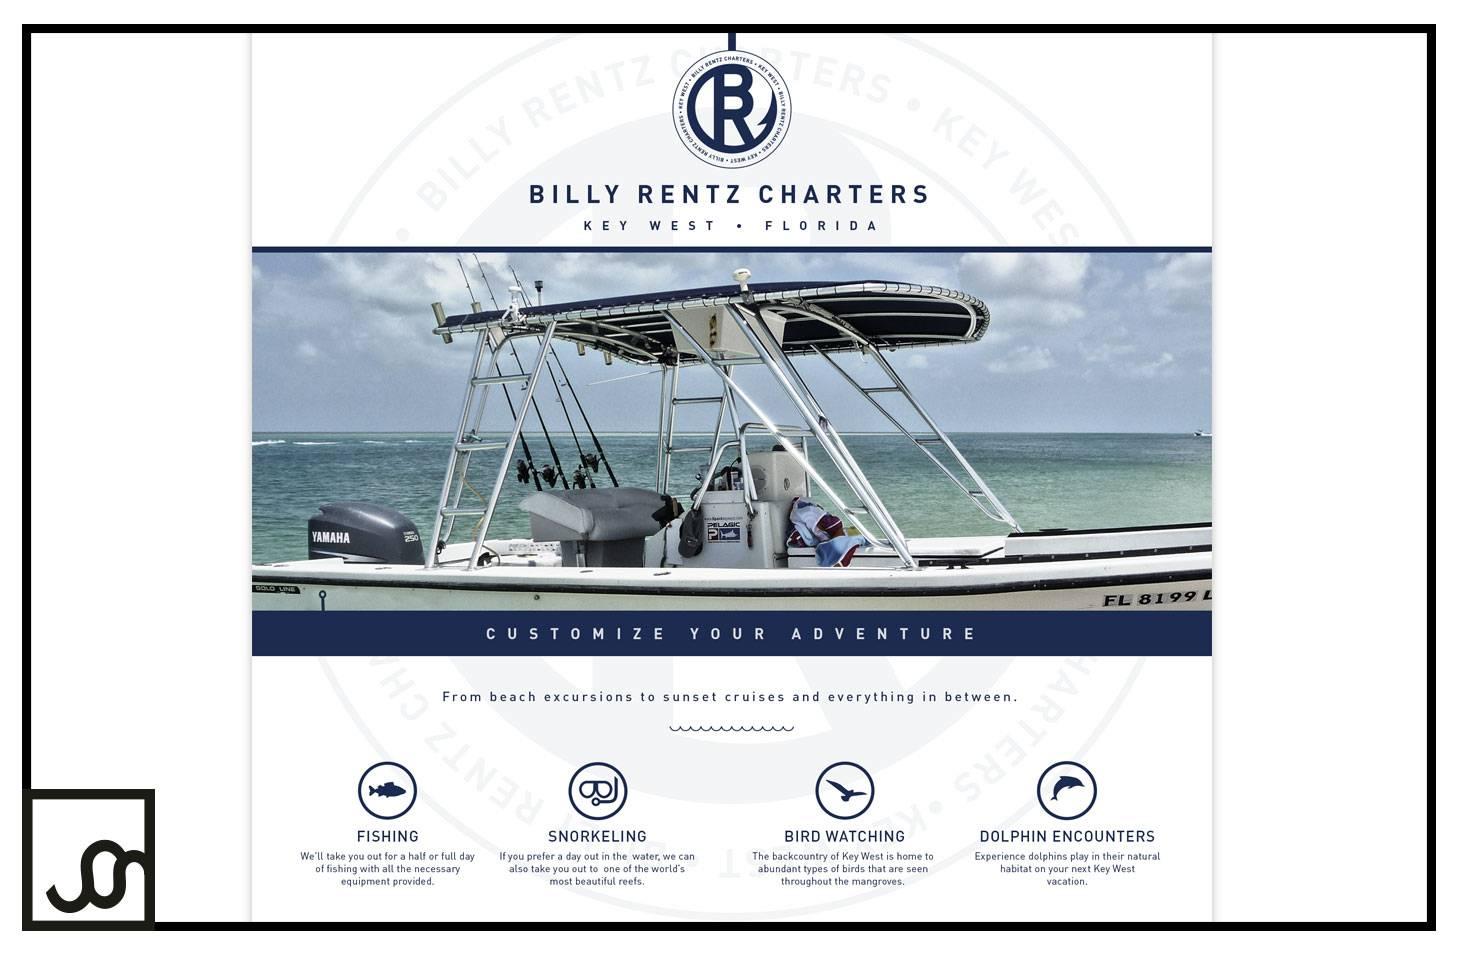 Billy Rentz Charters Web Page